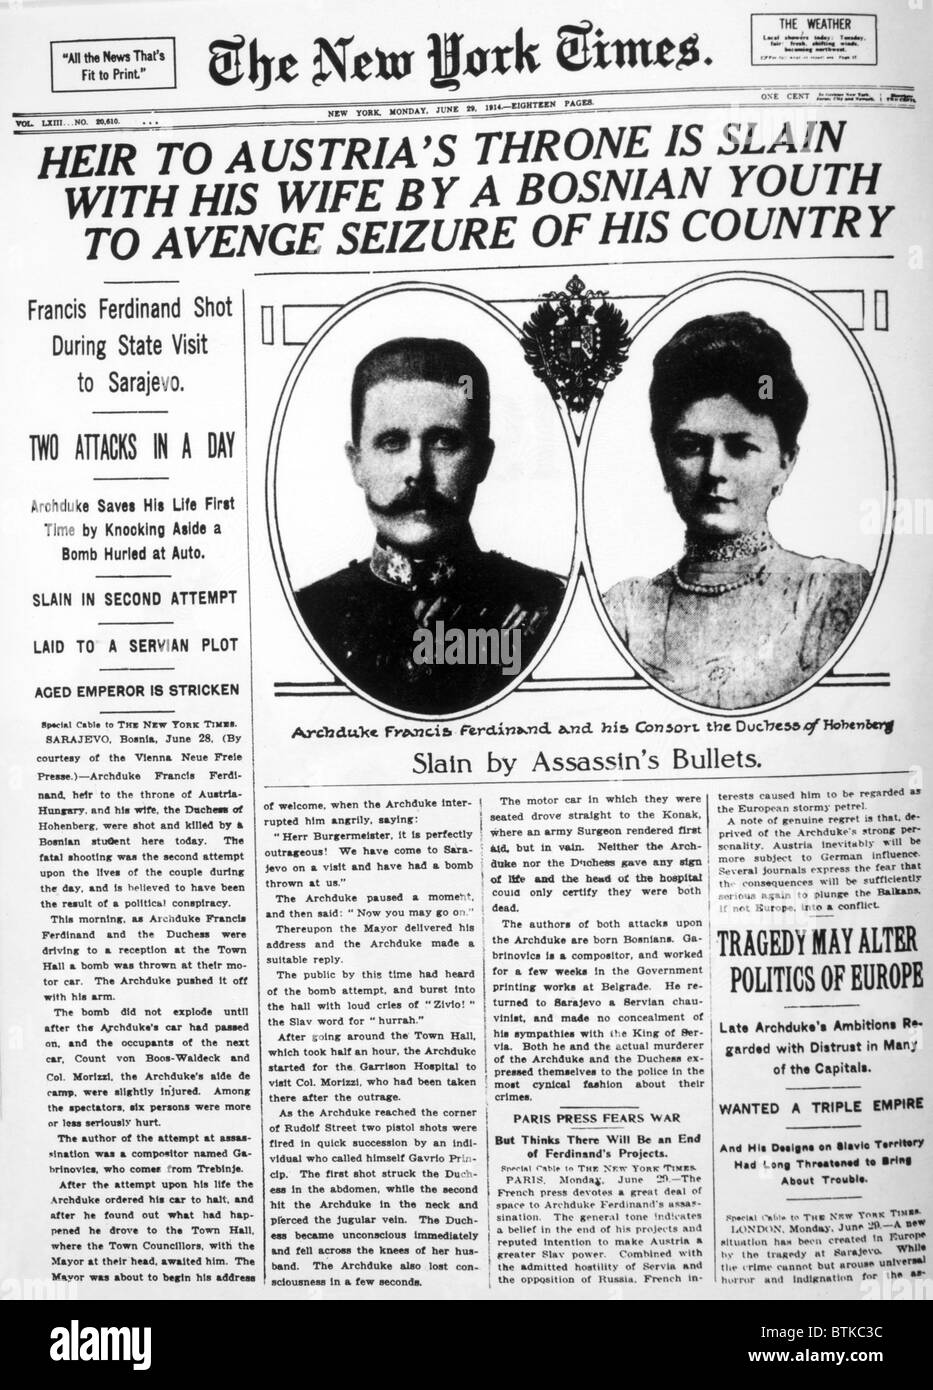 Archive, June 1914: The assassination of Archduke Franz Ferdinand